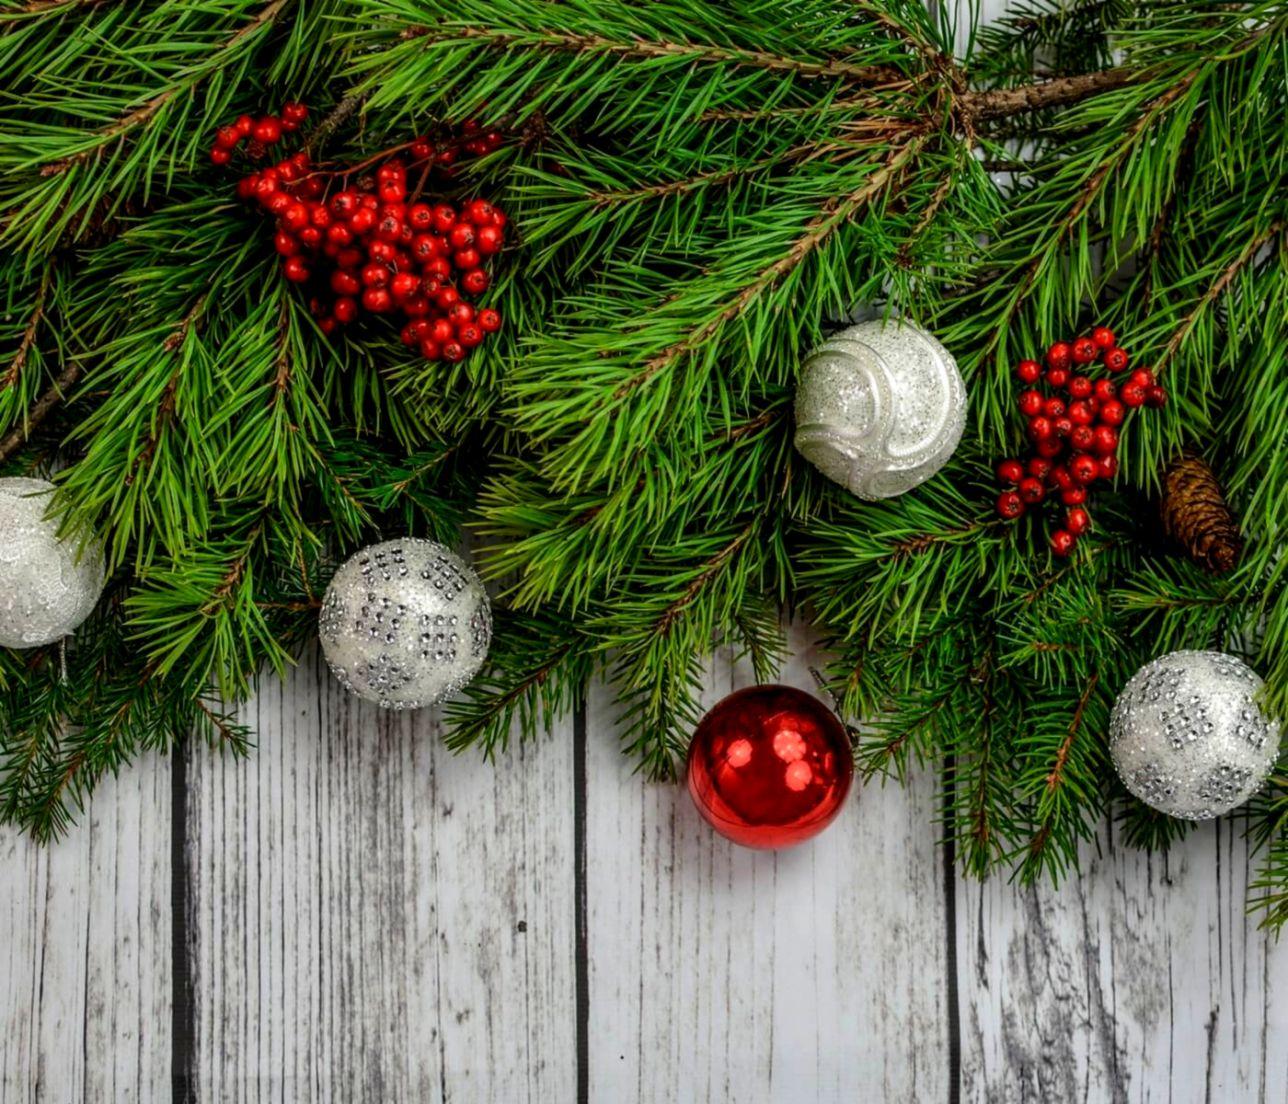 Ornament Merry Christmas Wallpaper Spot Wallpapers